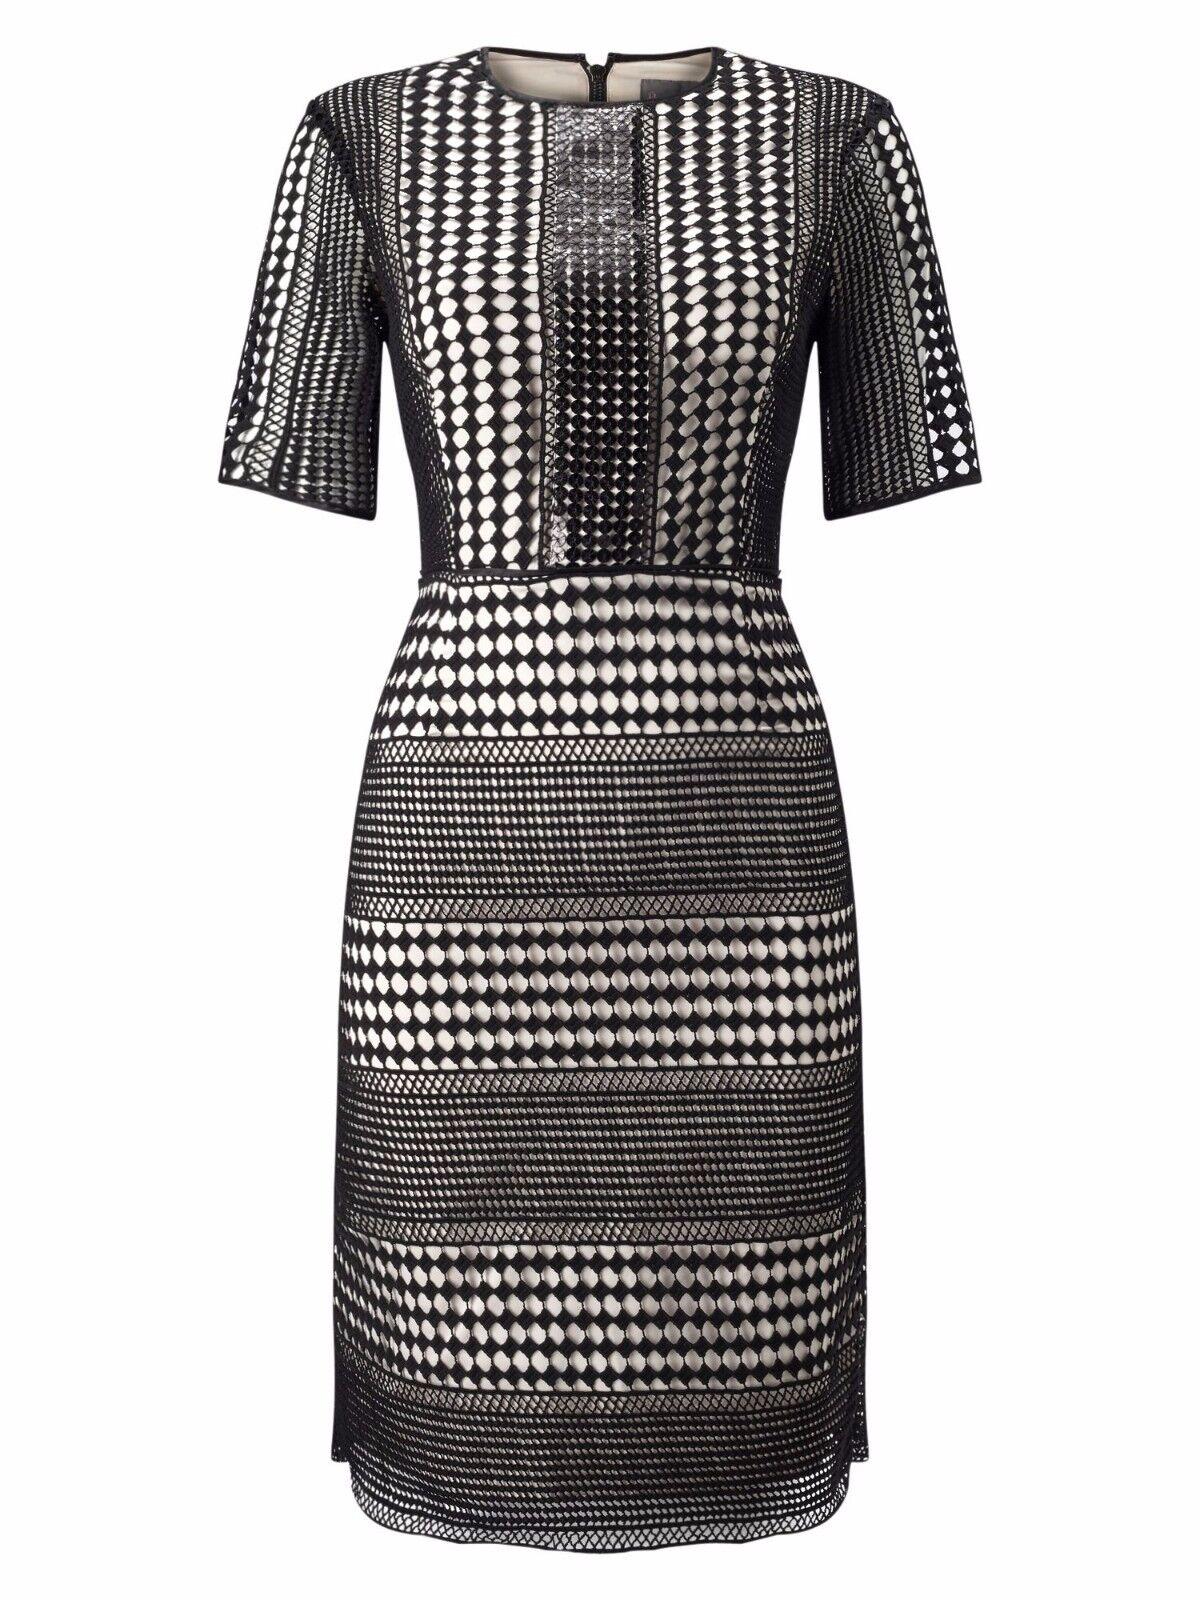 Phase huit Alison Sequin Robe schwarz Größe UK 16   LF075 mm 05